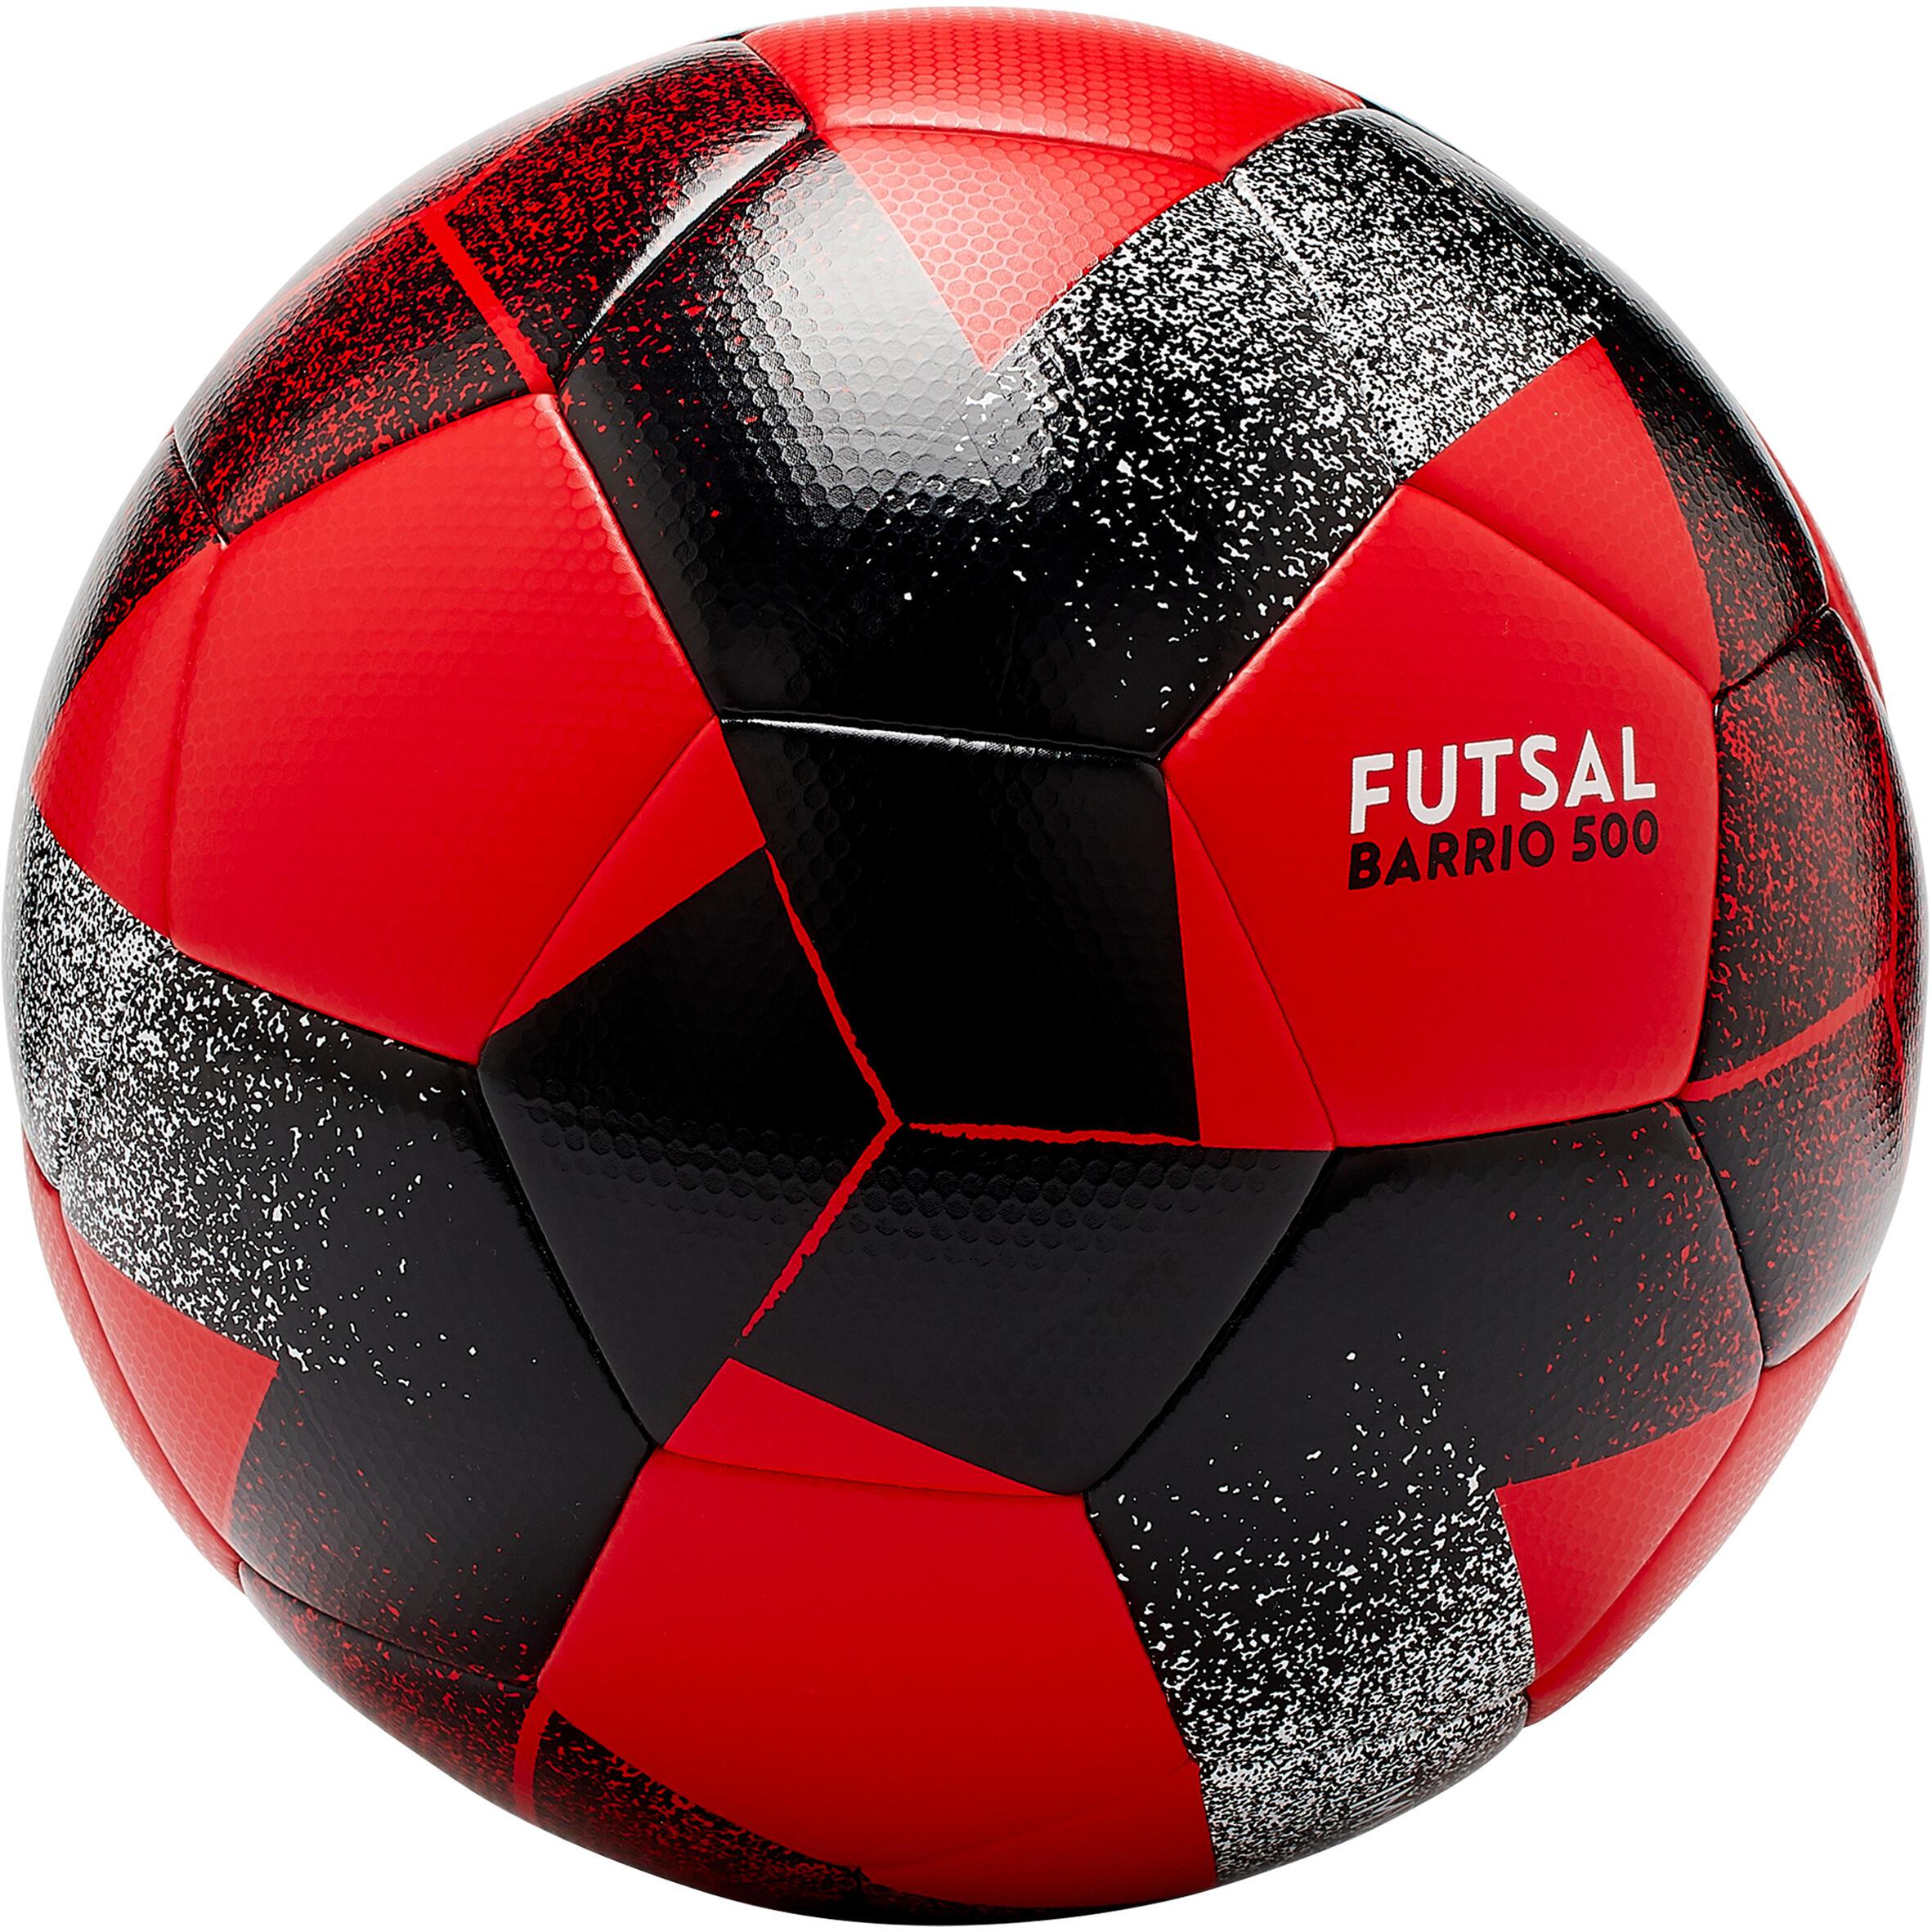 ocupado venganza sacudir  Balones fútbol sala | Decathlon